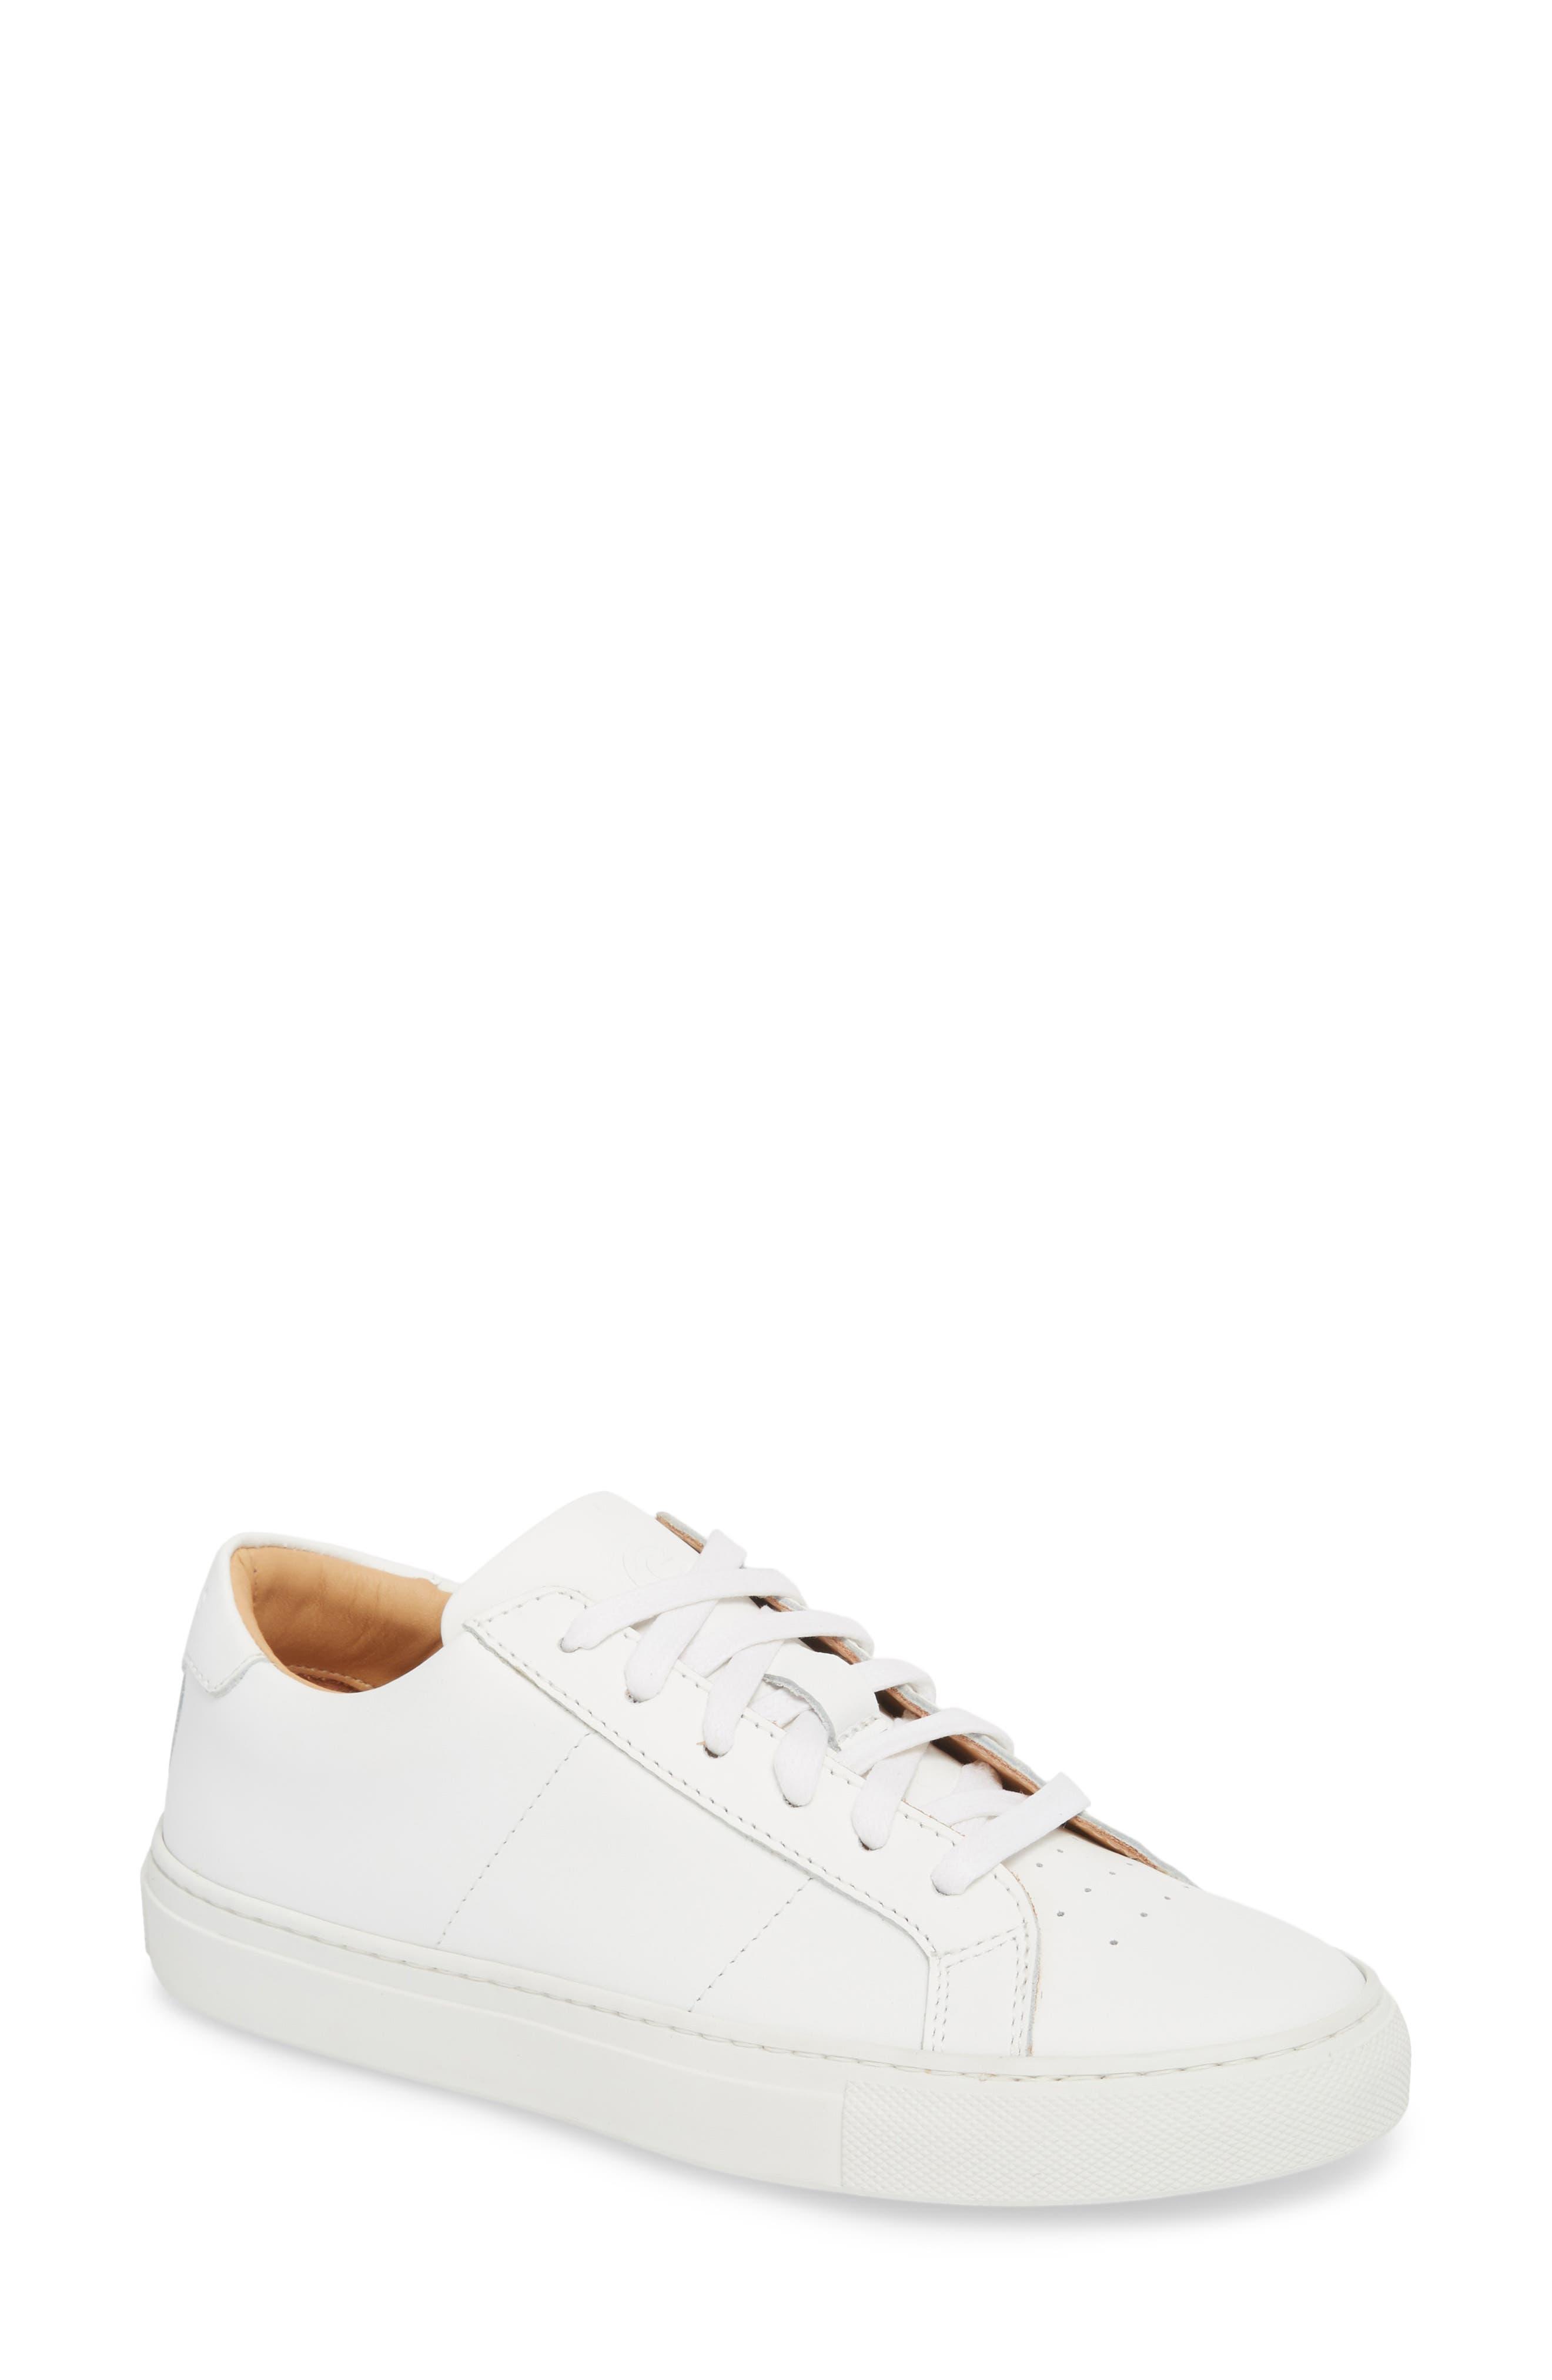 Royale Sneaker,                             Main thumbnail 1, color,                             White Flat Leather